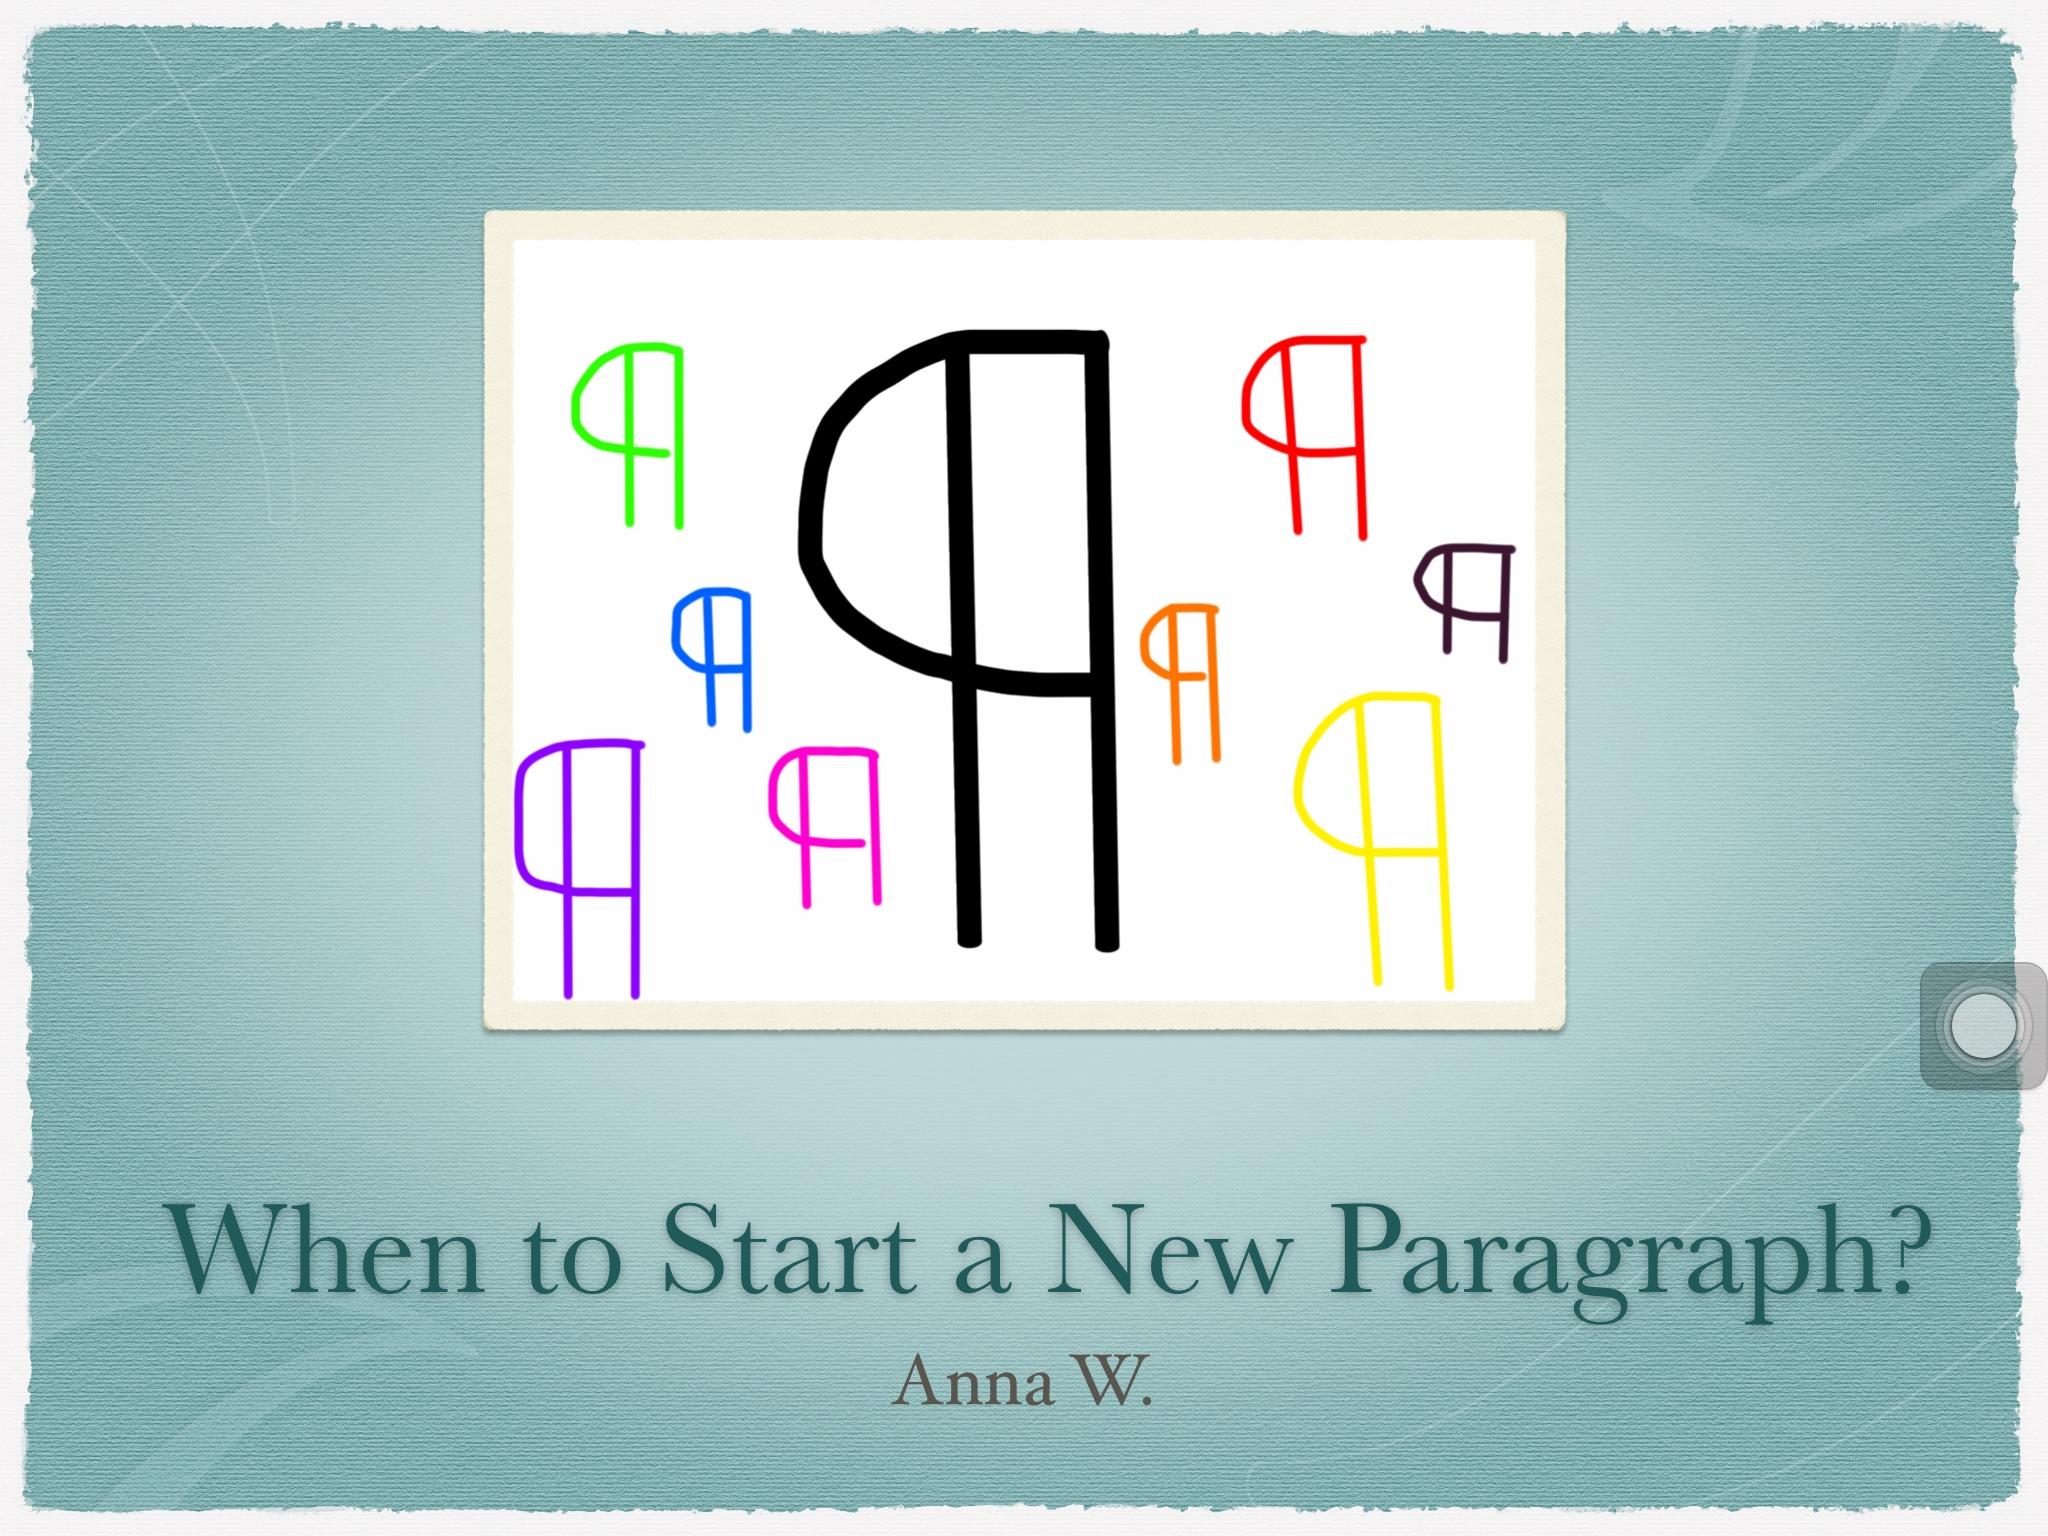 When do you start a new paragraph?